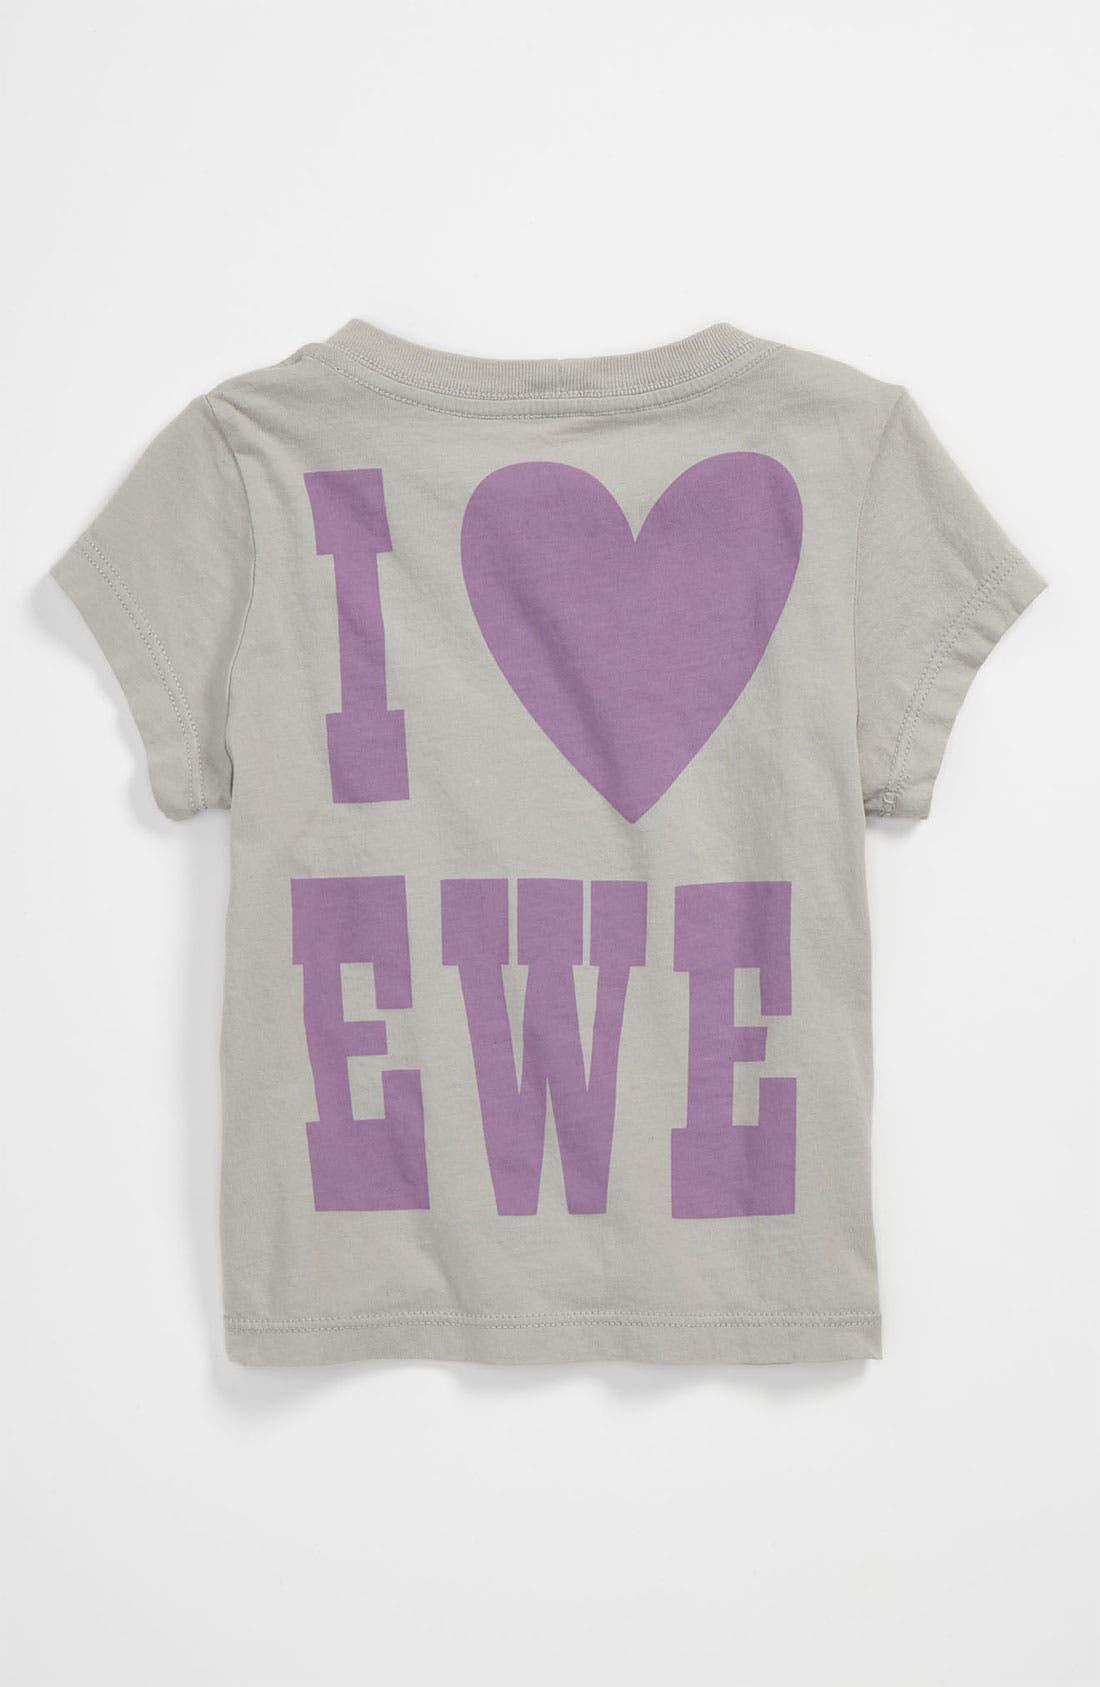 Alternate Image 2  - Peek 'I Love Ewe' Tee (Baby)